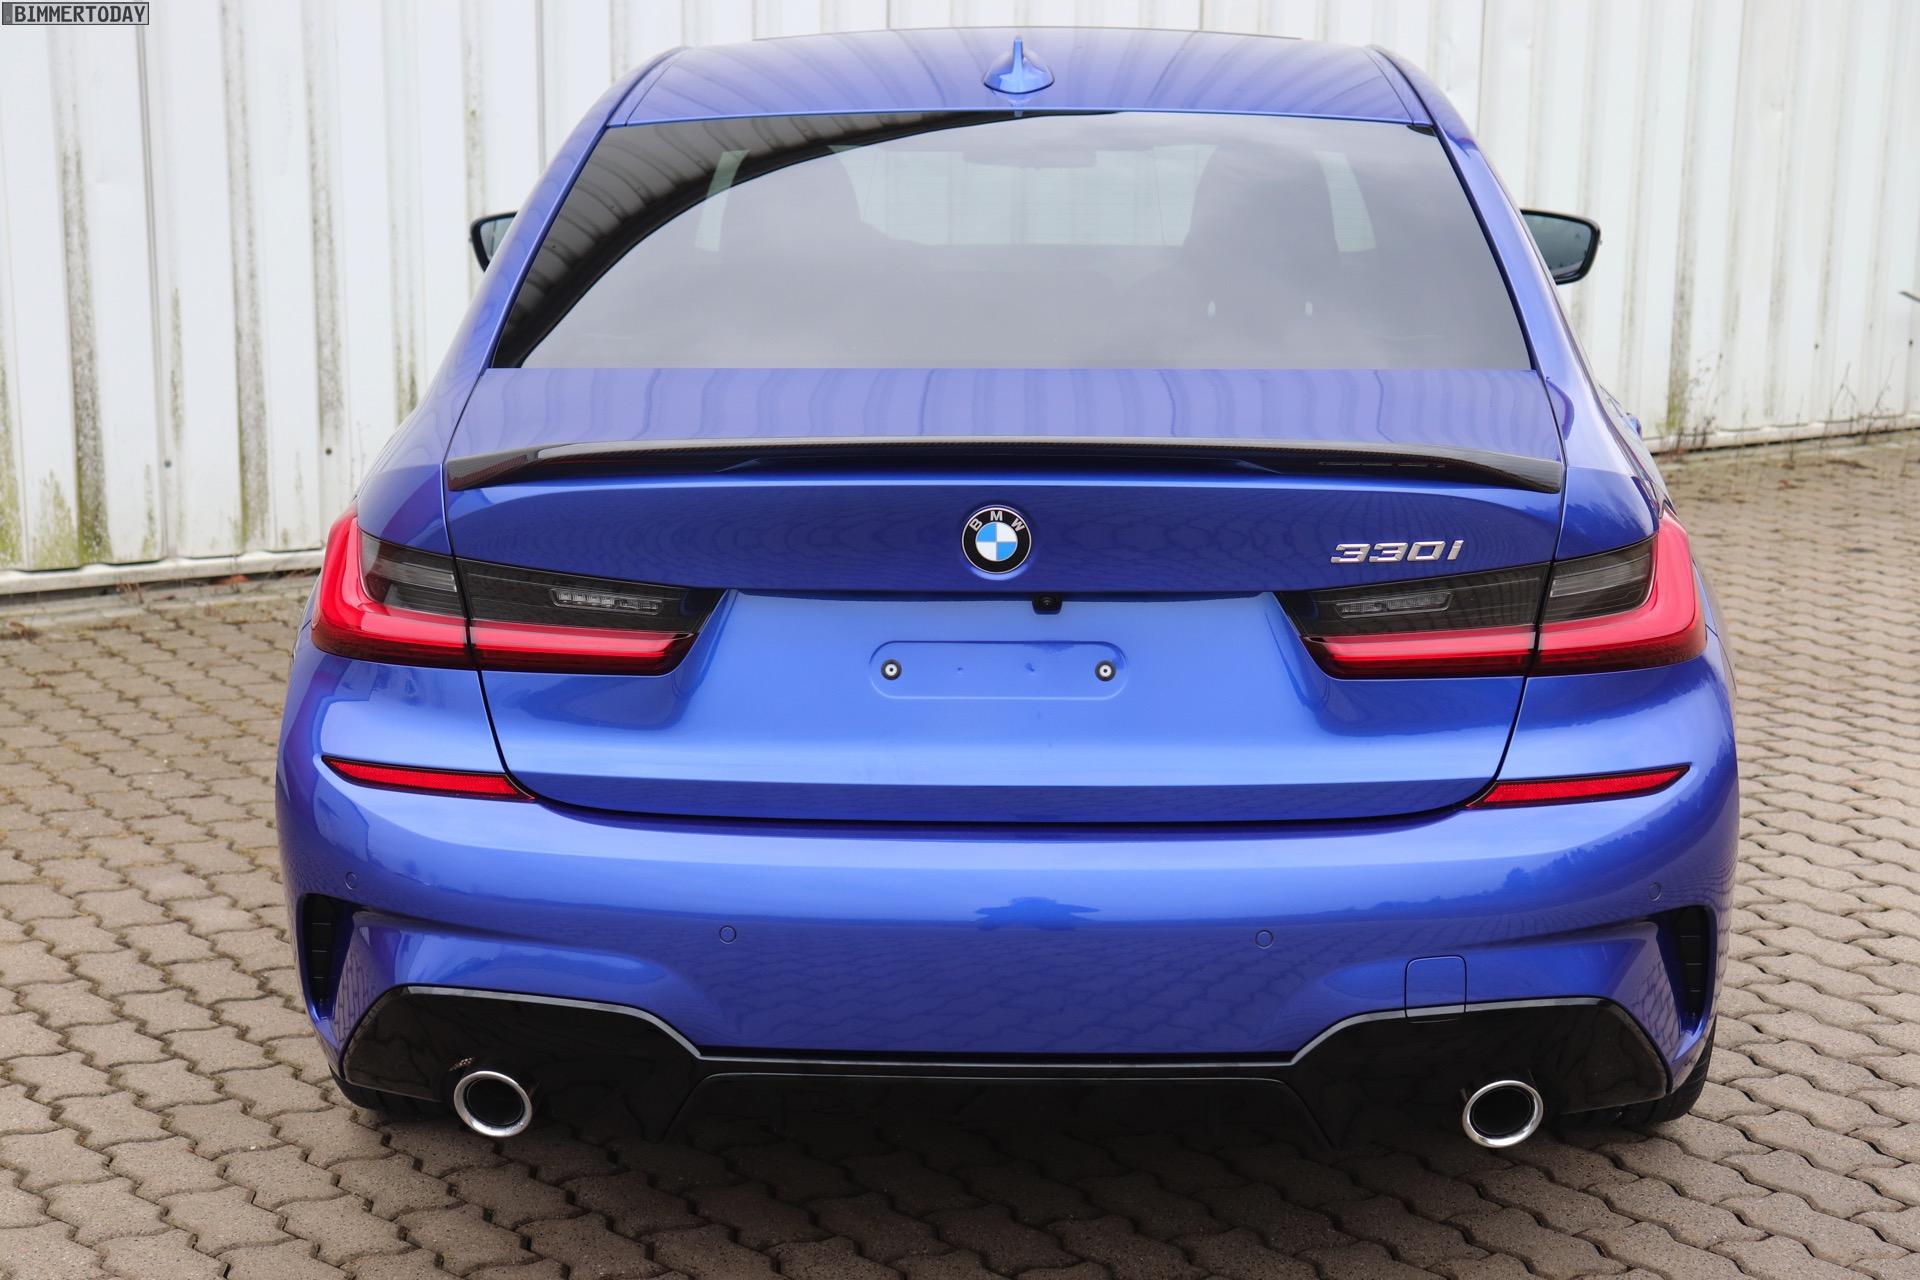 Name:  2019-BMW-330i-G20-M-Performance-Parts-1.jpg2019-BMW-330i-G20-M-Performance-Parts-1.jpg2019-BMW-3.jpg Views: 4448 Size:  455.8 KB